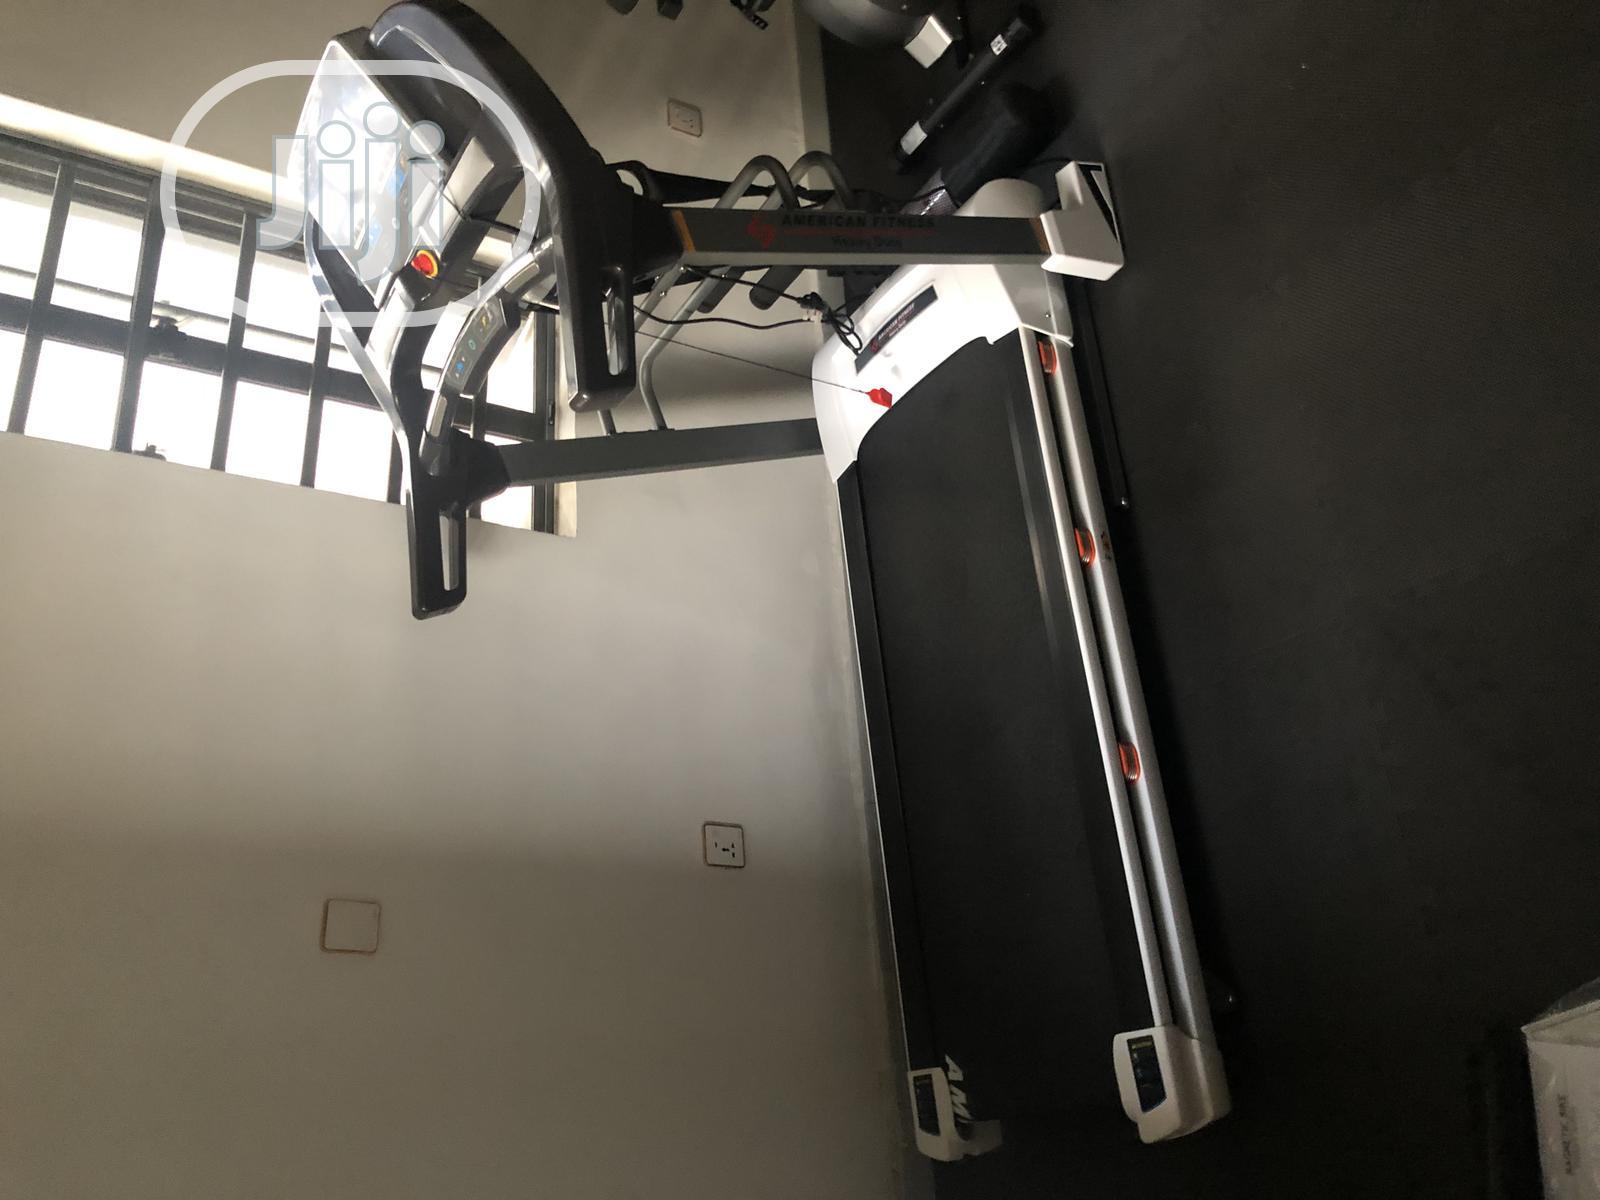 Brand New 2.5hp America Fitness Treadmill With Massager | Sports Equipment for sale in Sagamu, Ogun State, Nigeria